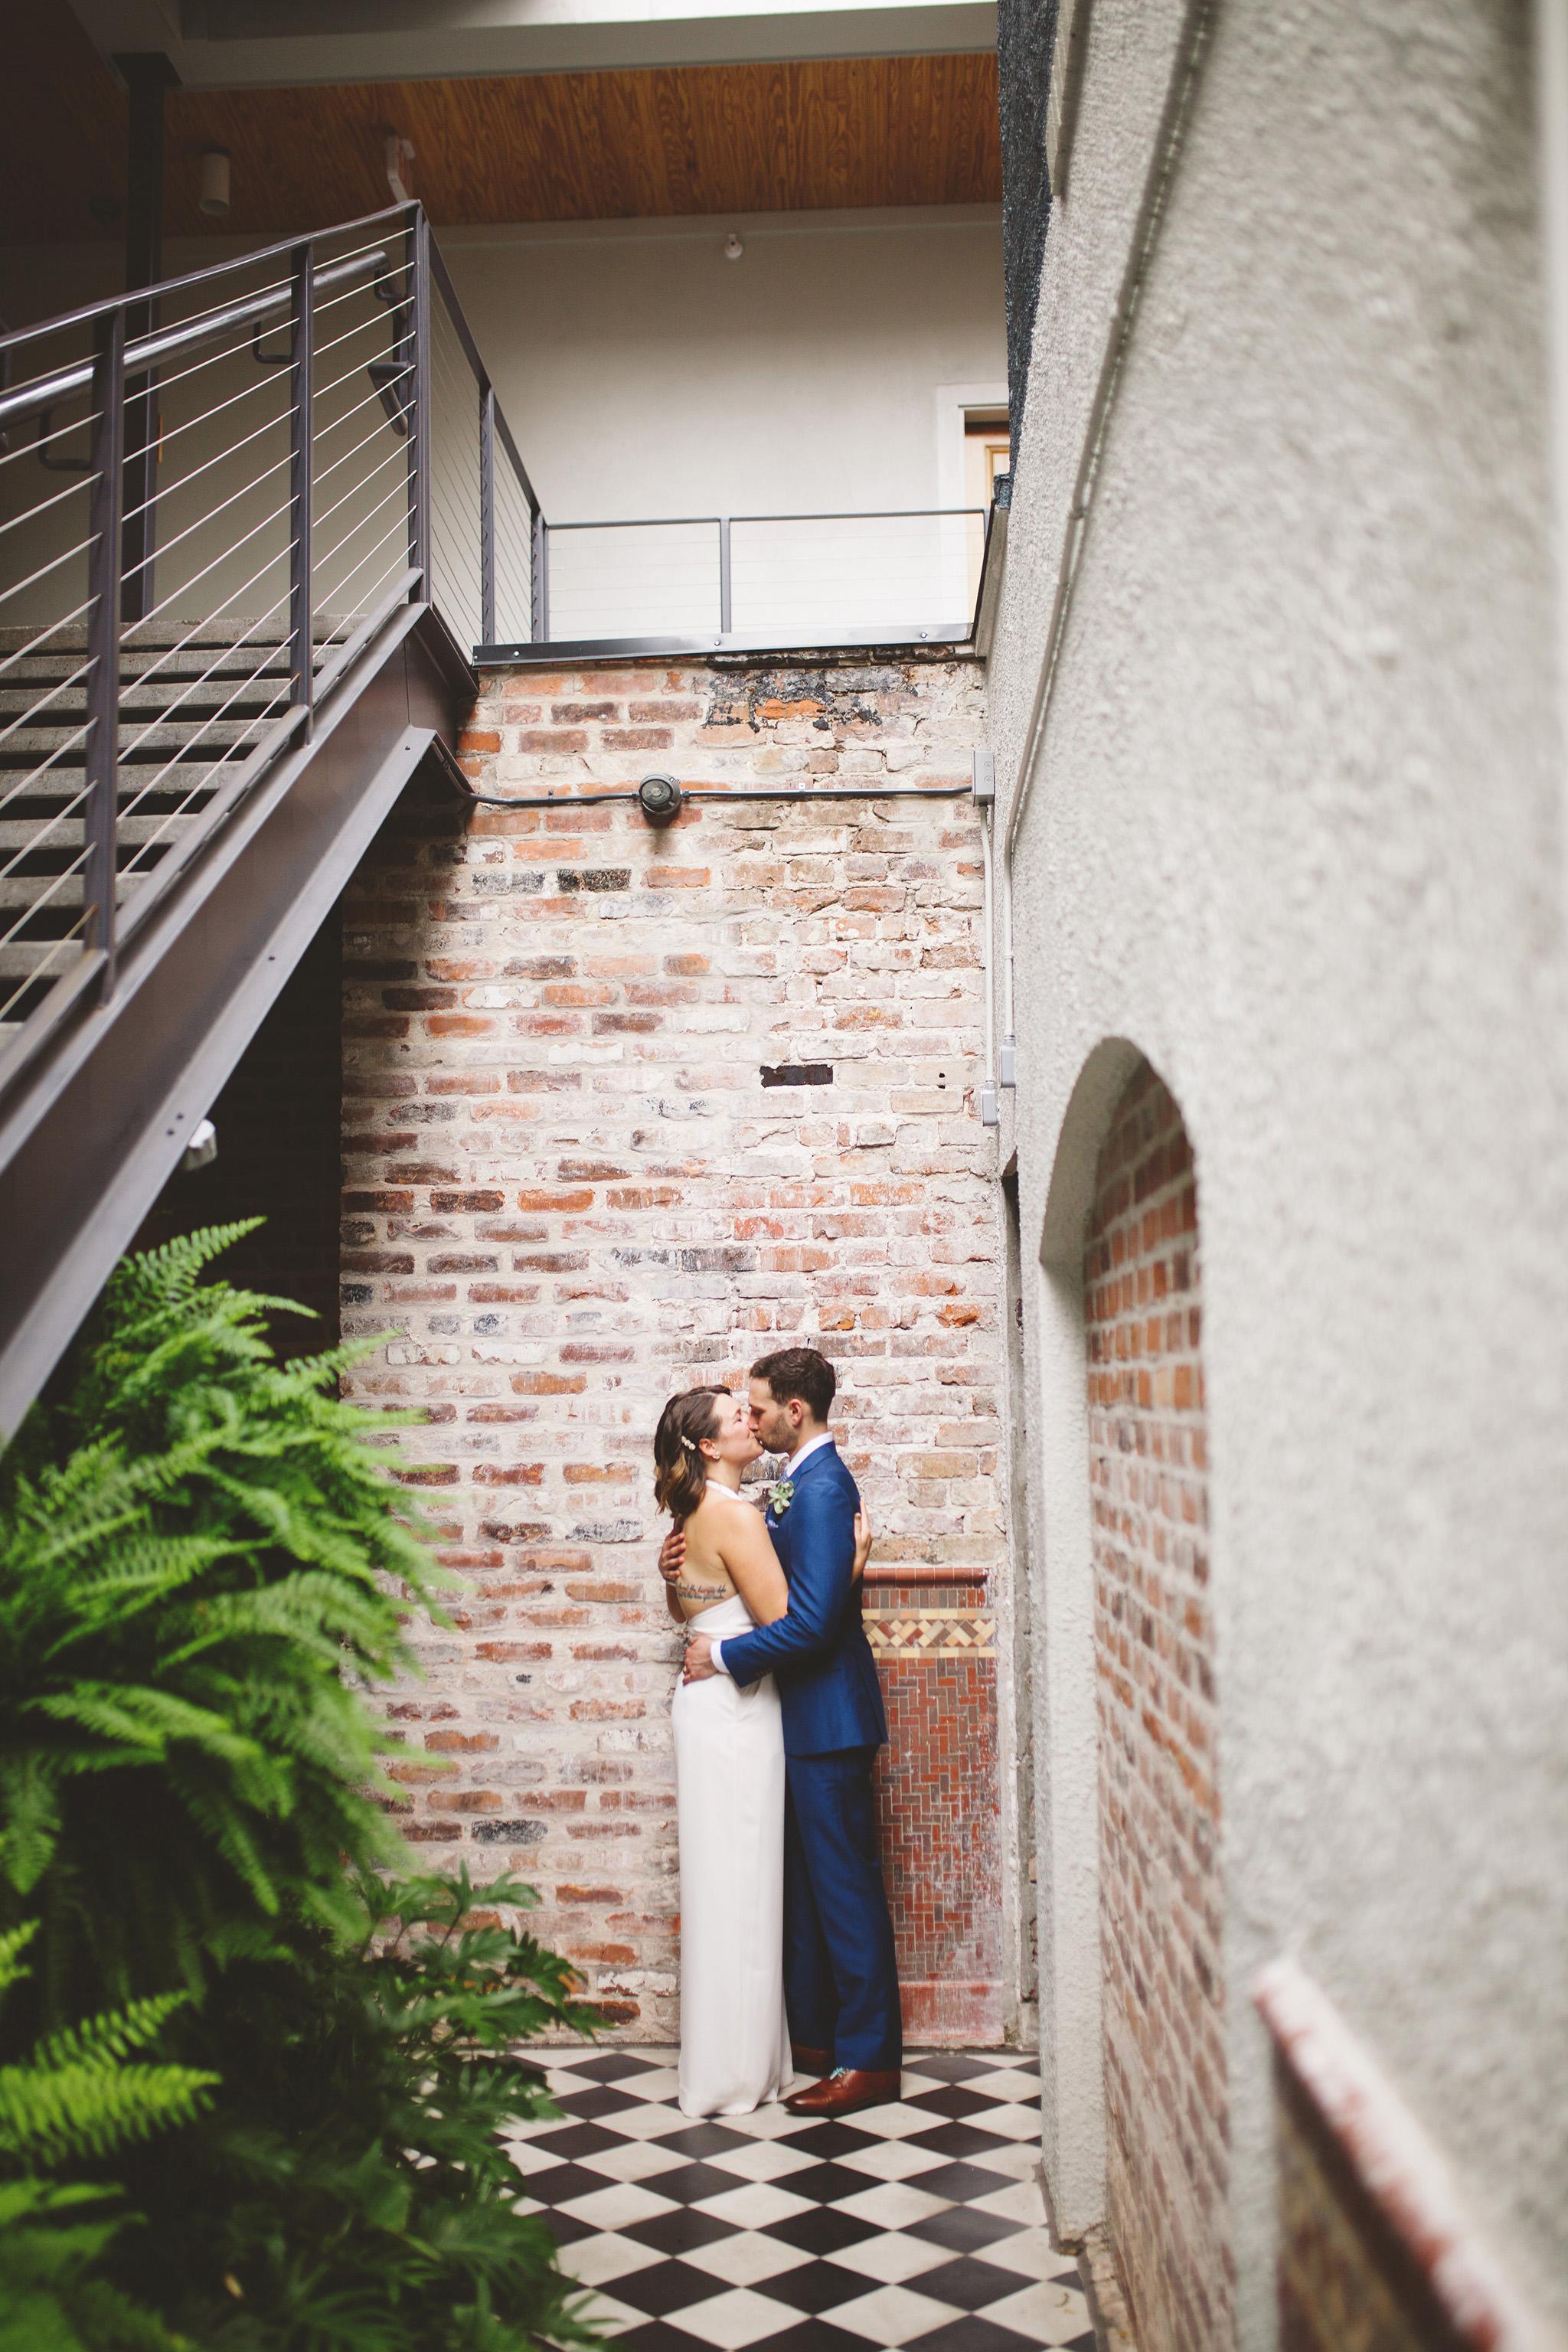 NOLA wedding at Catahoula Hotel